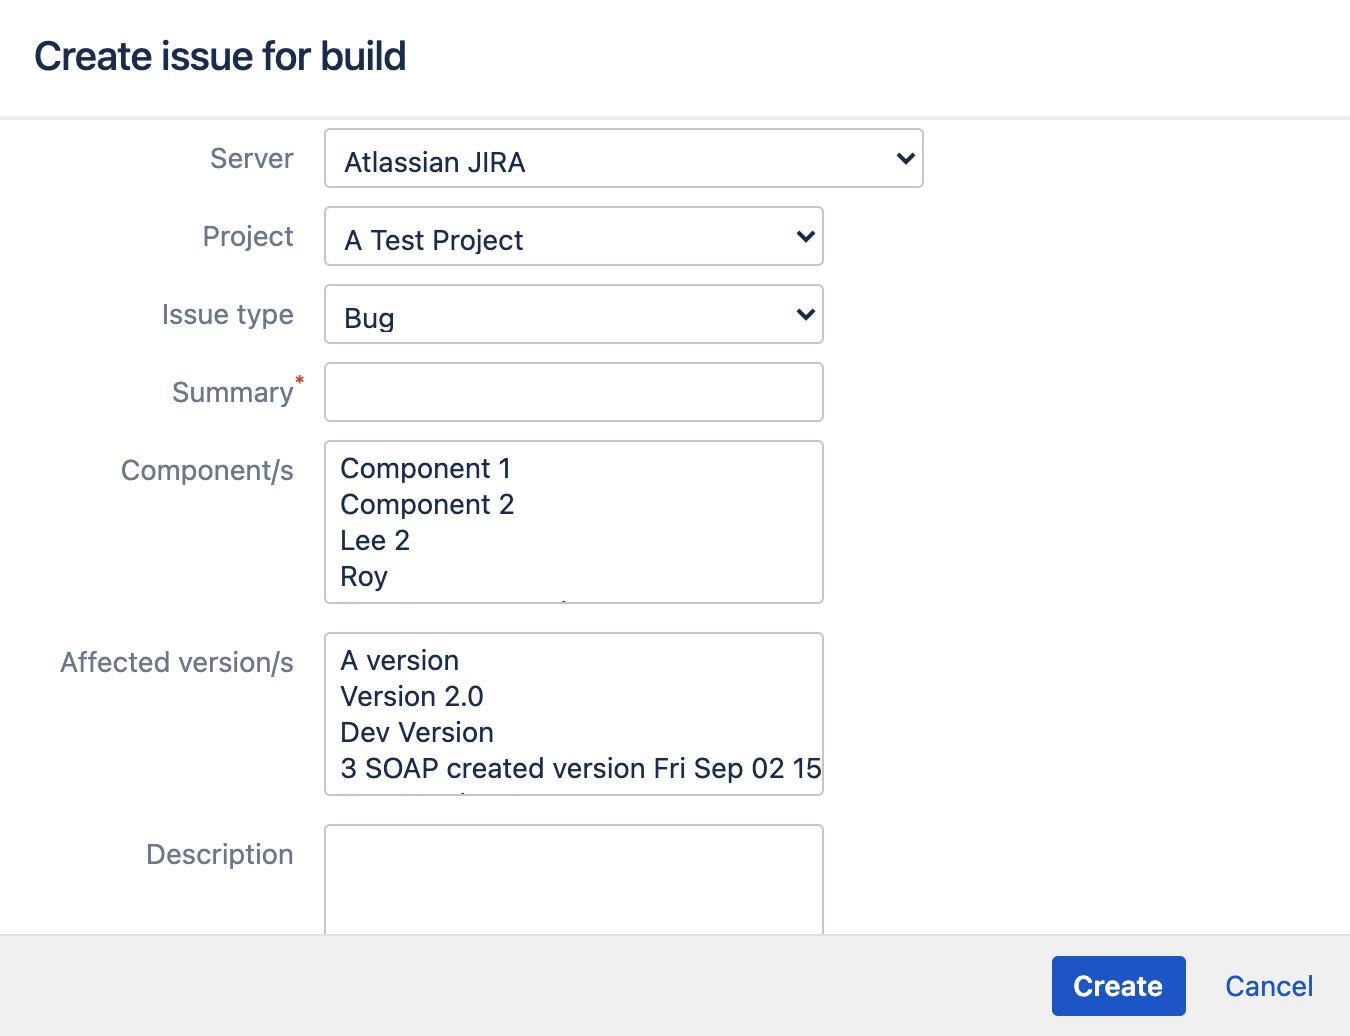 Create Jira issue for build window